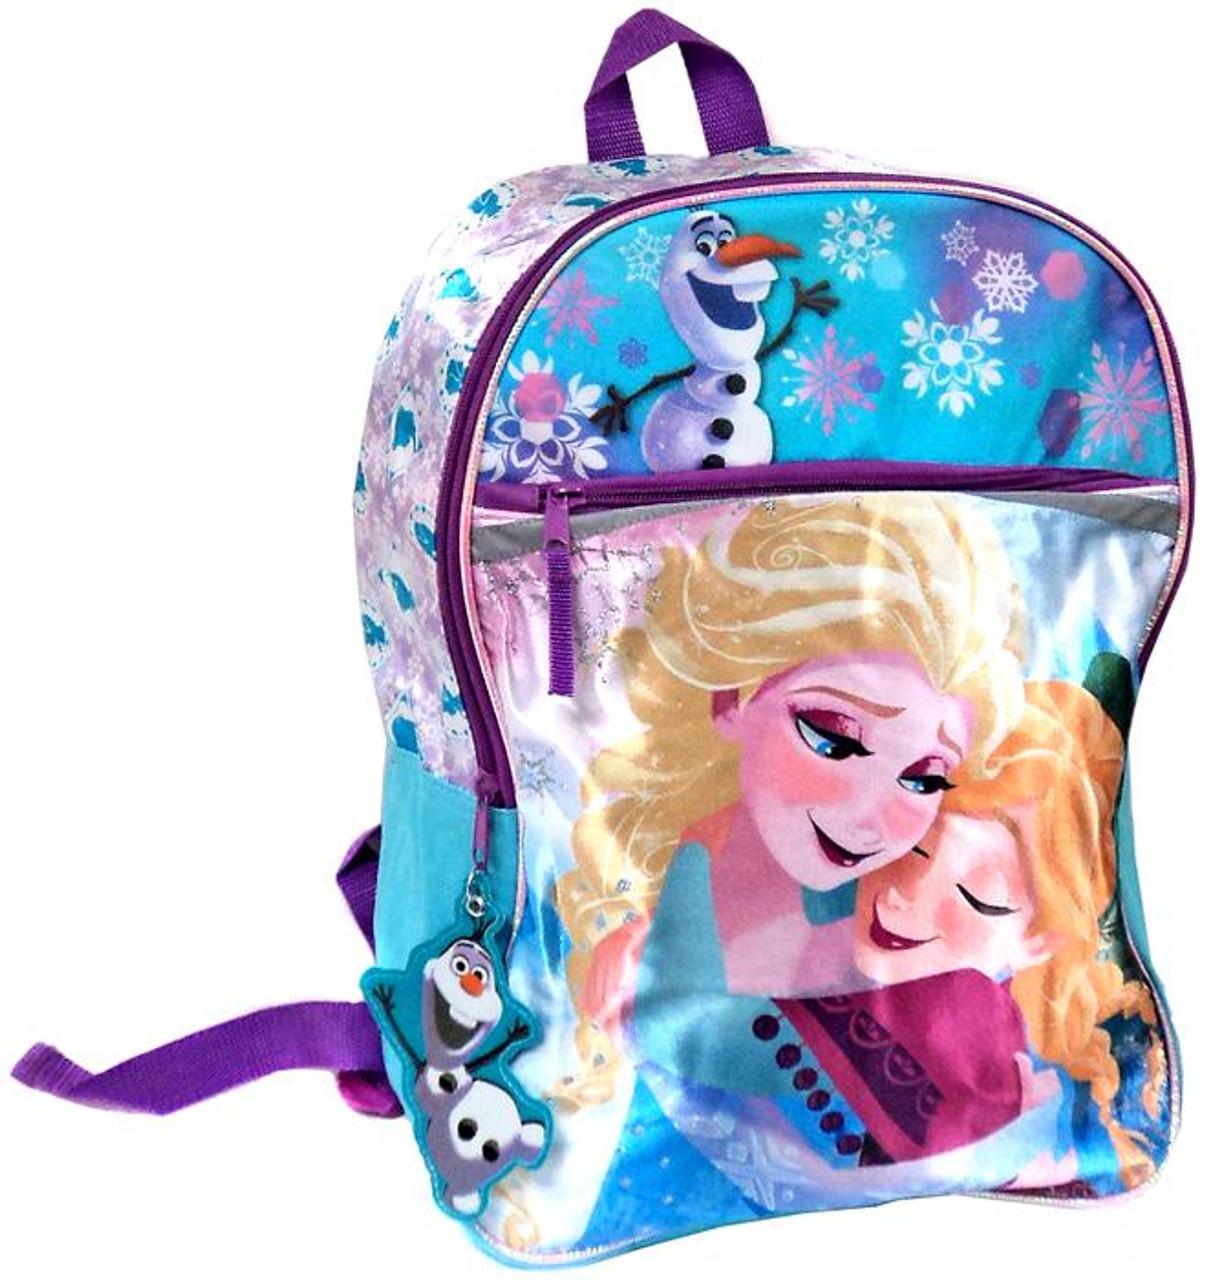 Disney Frozen Anna, Elsa & Olaf Backpack [Satin]